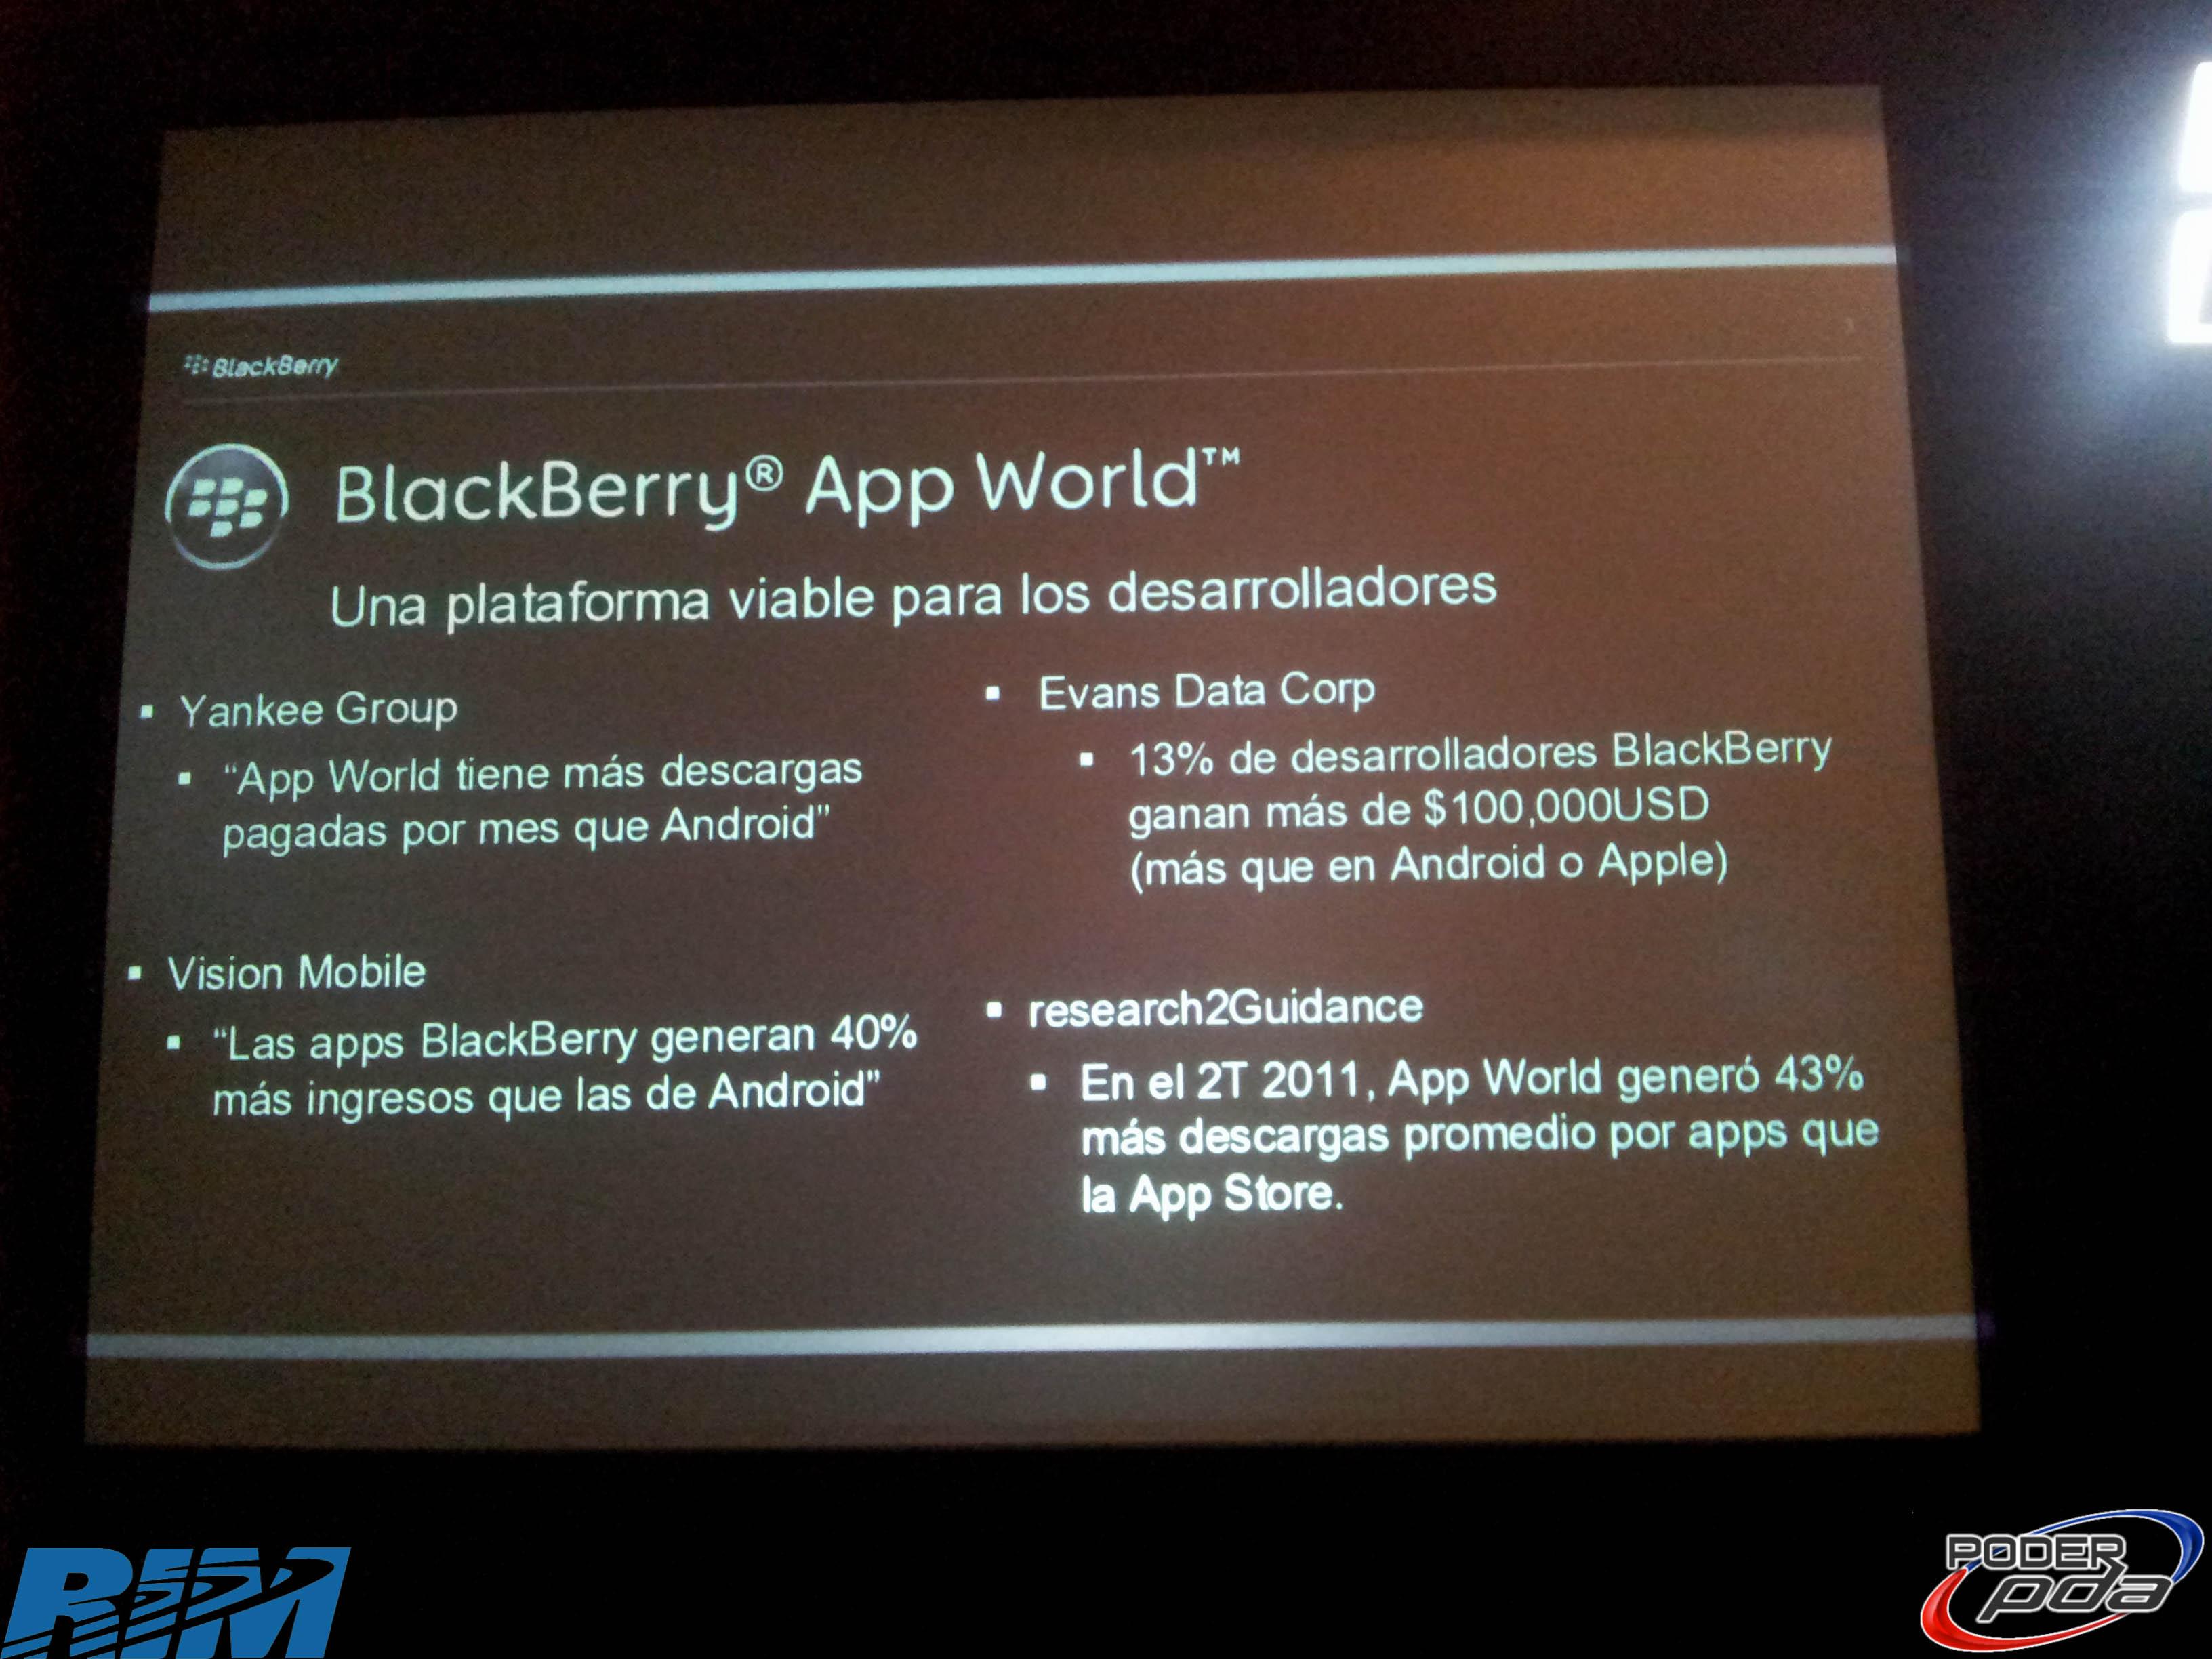 Vision-RIM-BlackBerry-Mexico-2012-17